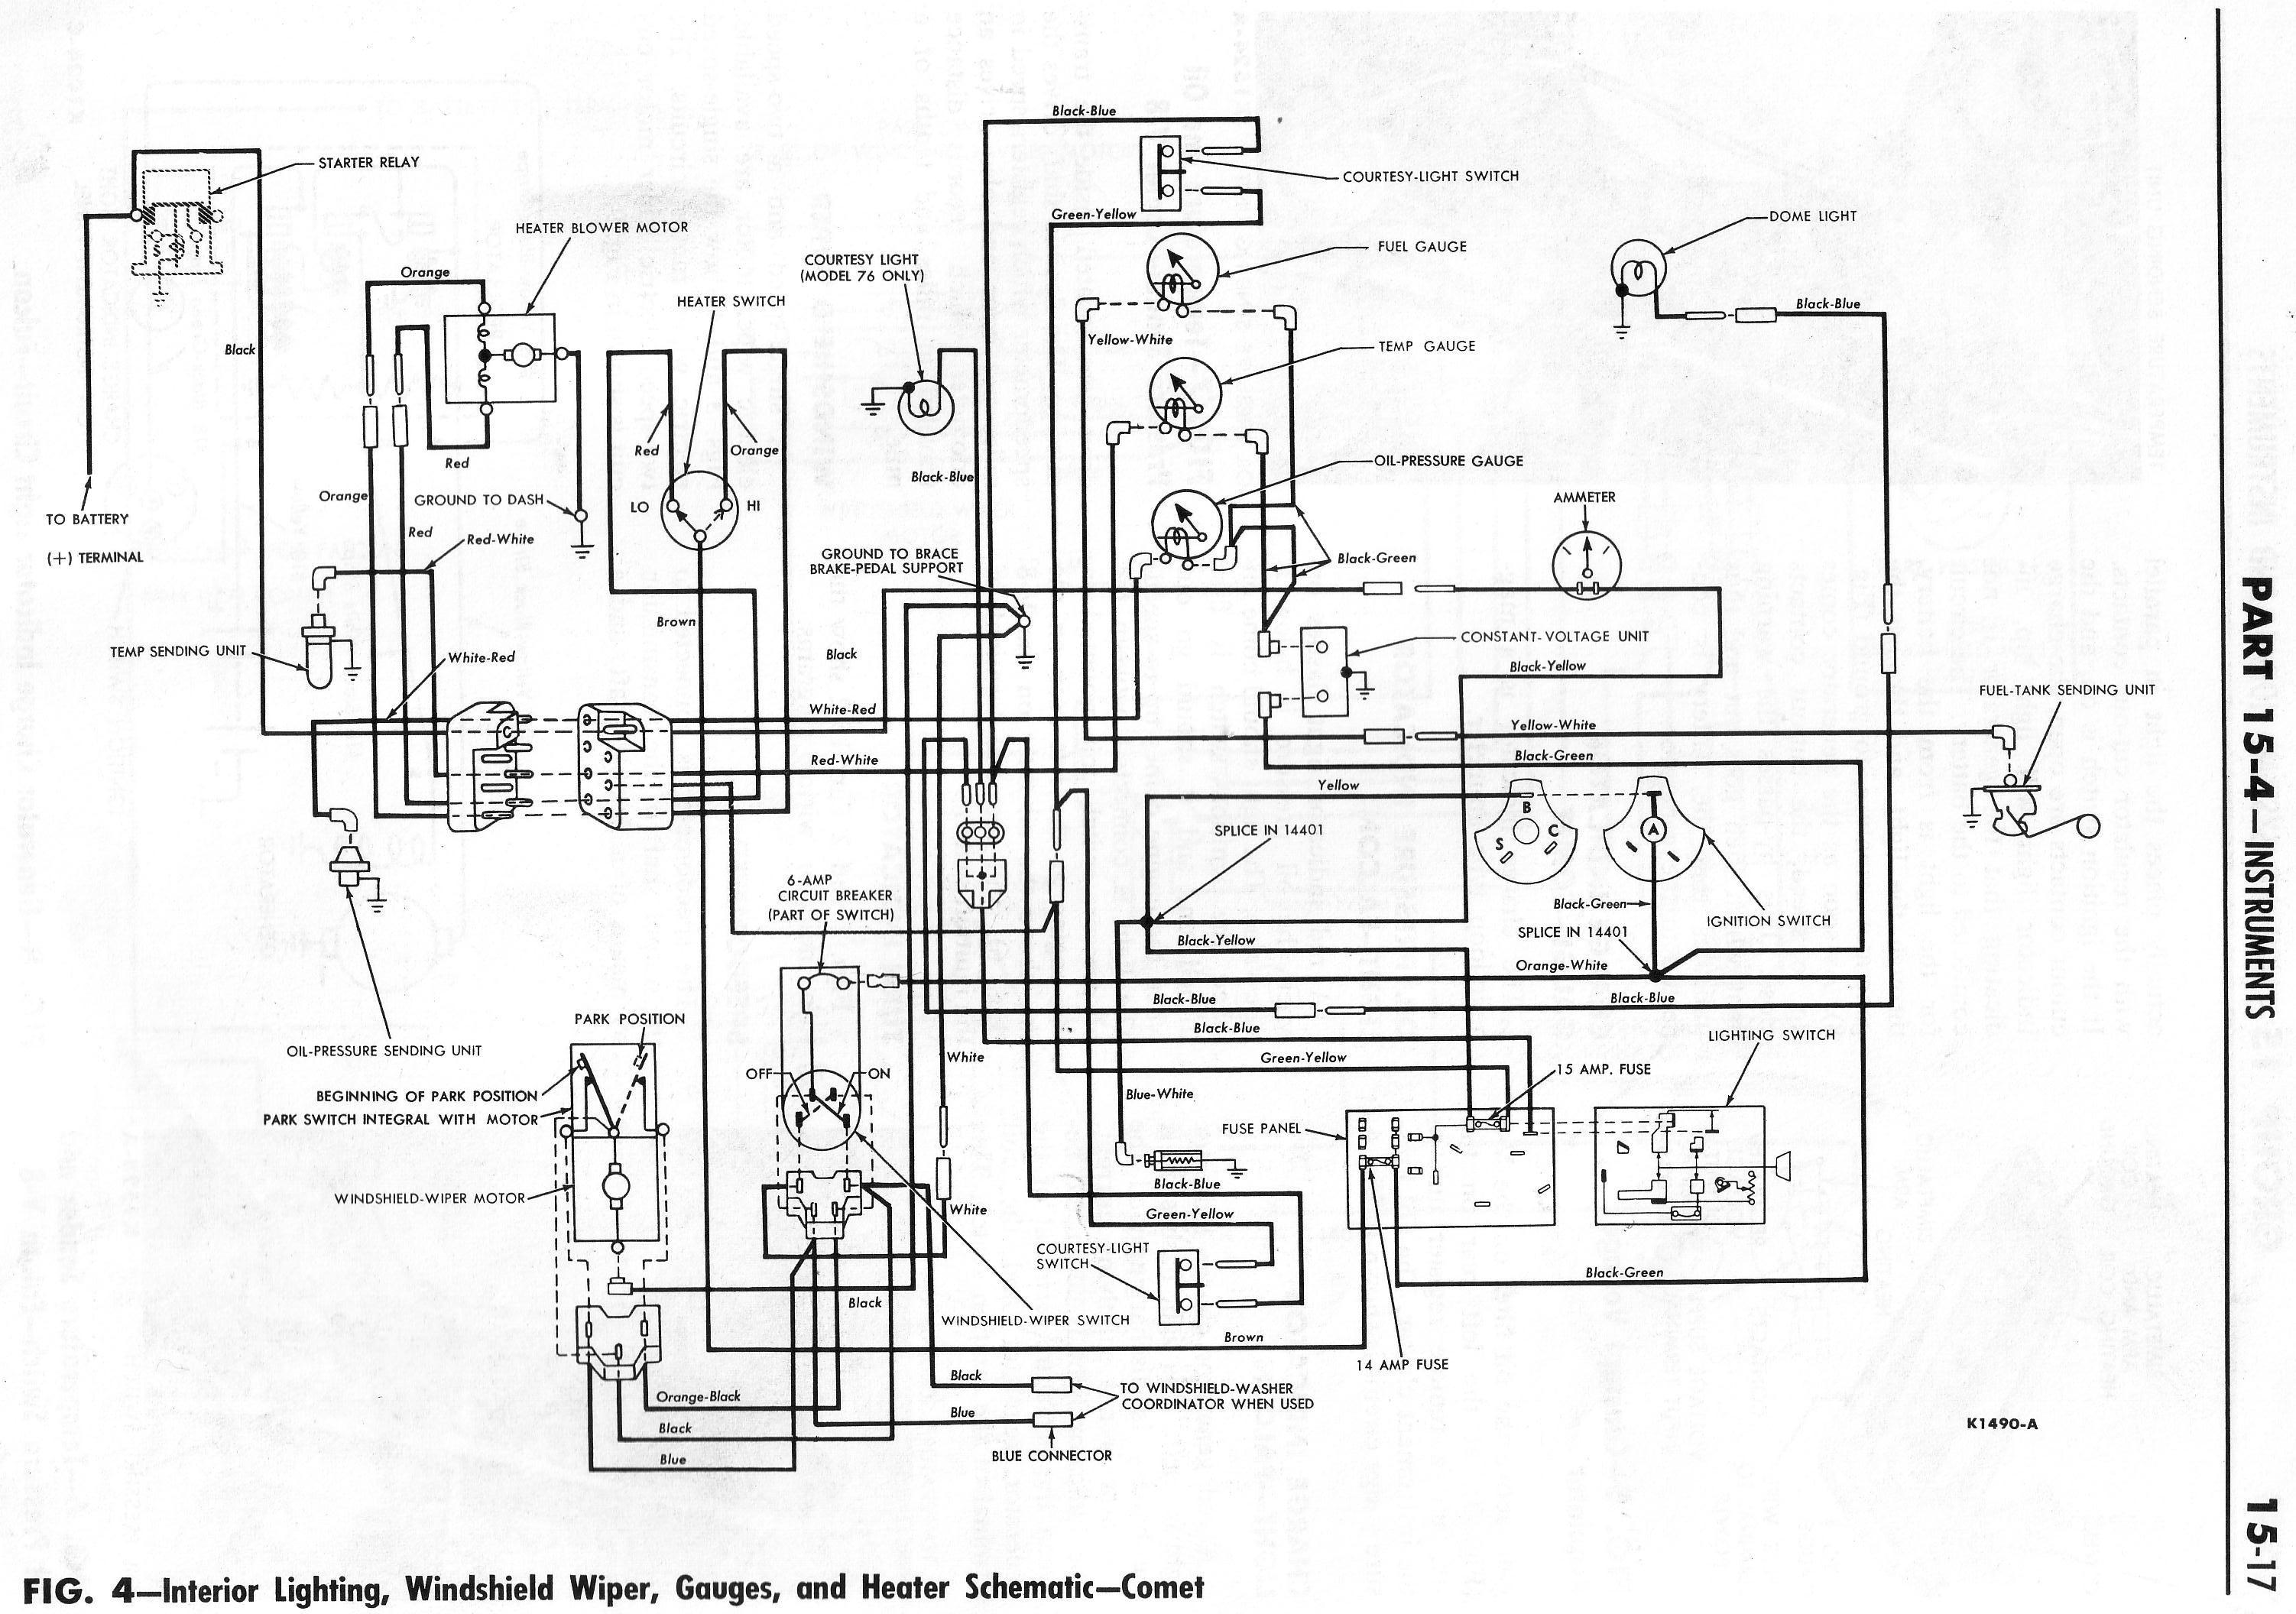 1964 Ranchero Wiring Diagrams - 4 Wire Alternator Wiring Diagram